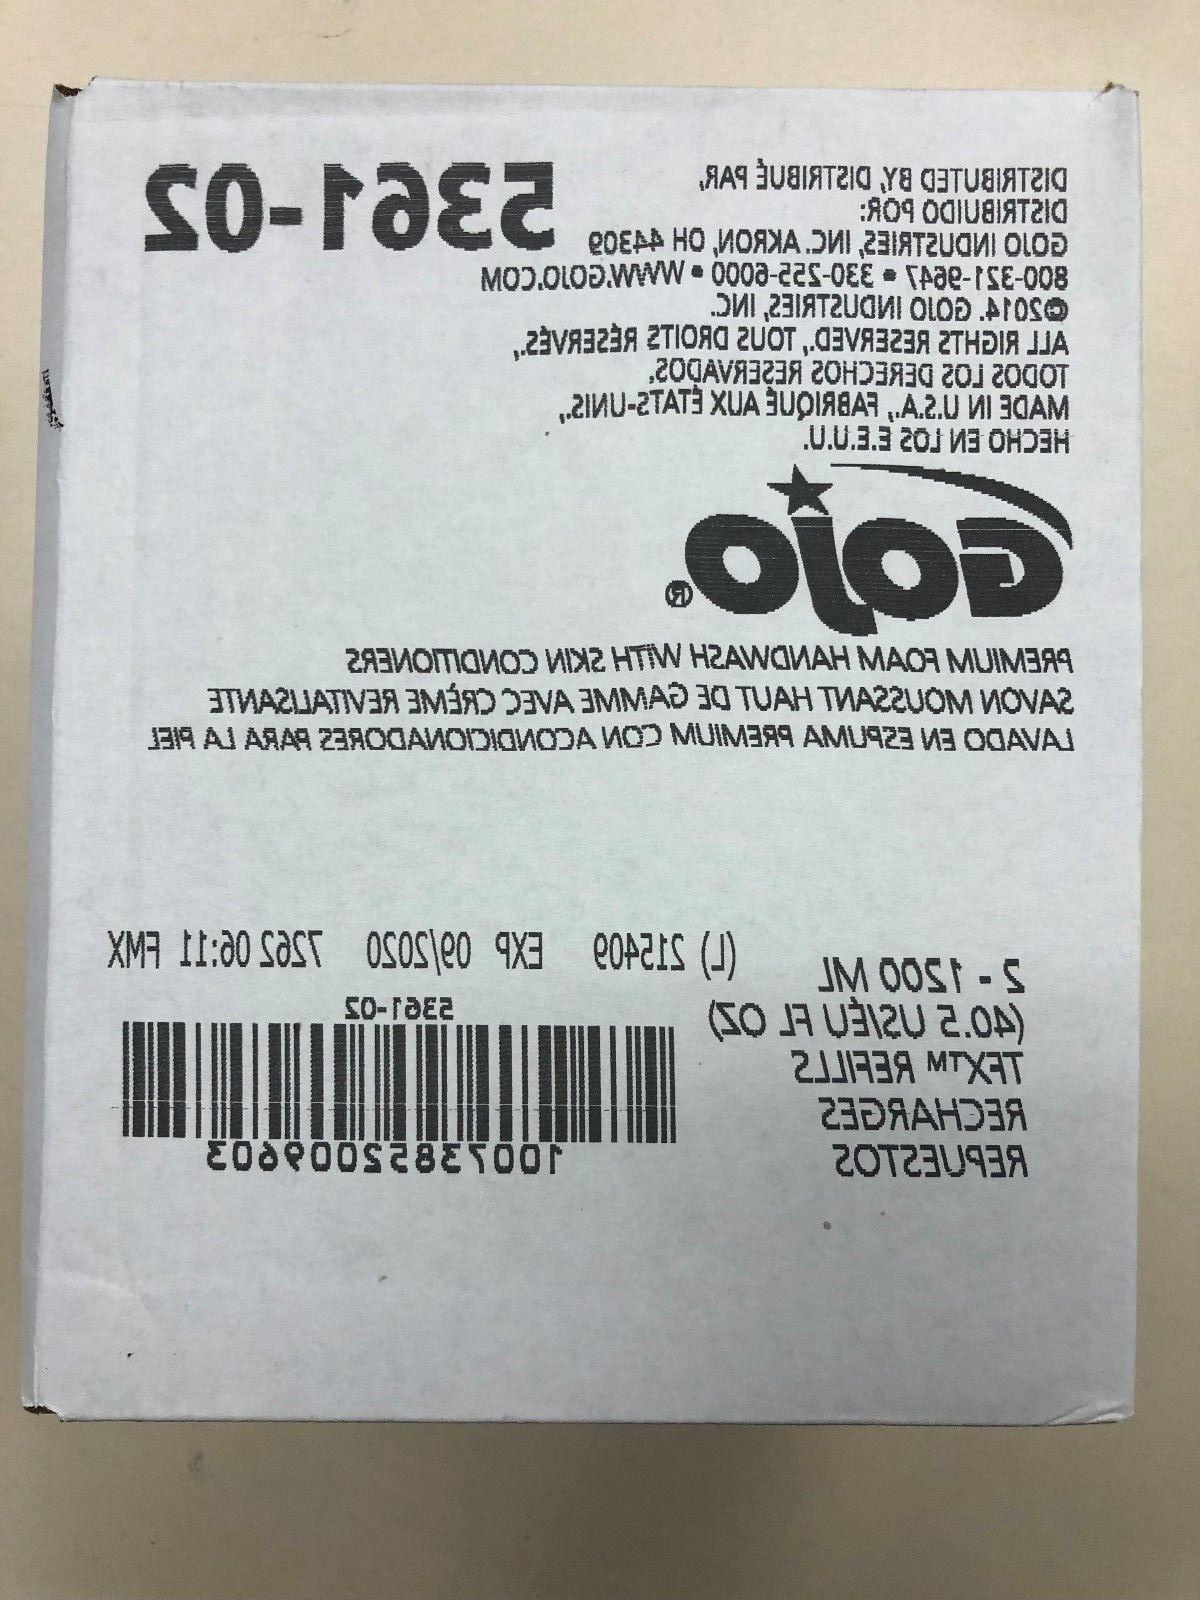 GOJO 5361-02 Premium Foam Hand Soap w/Moisturizer, case of 2